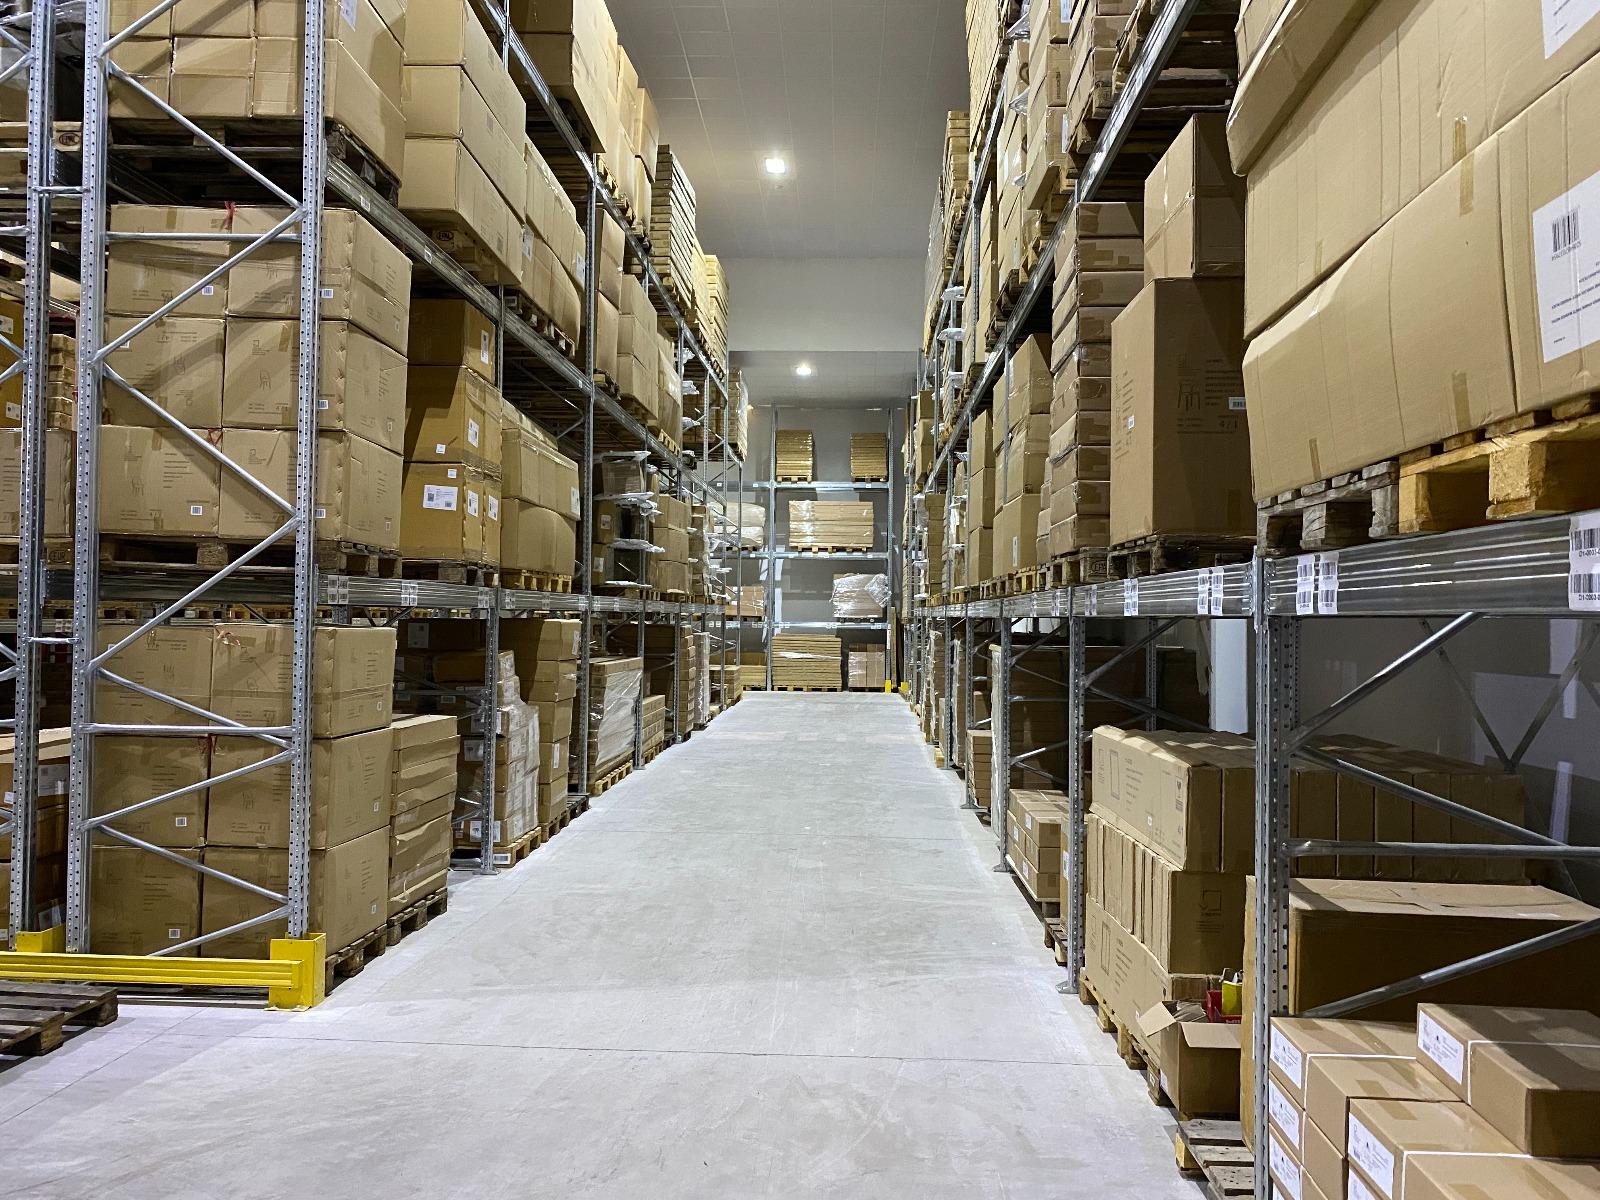 Logistics warehouse image #3